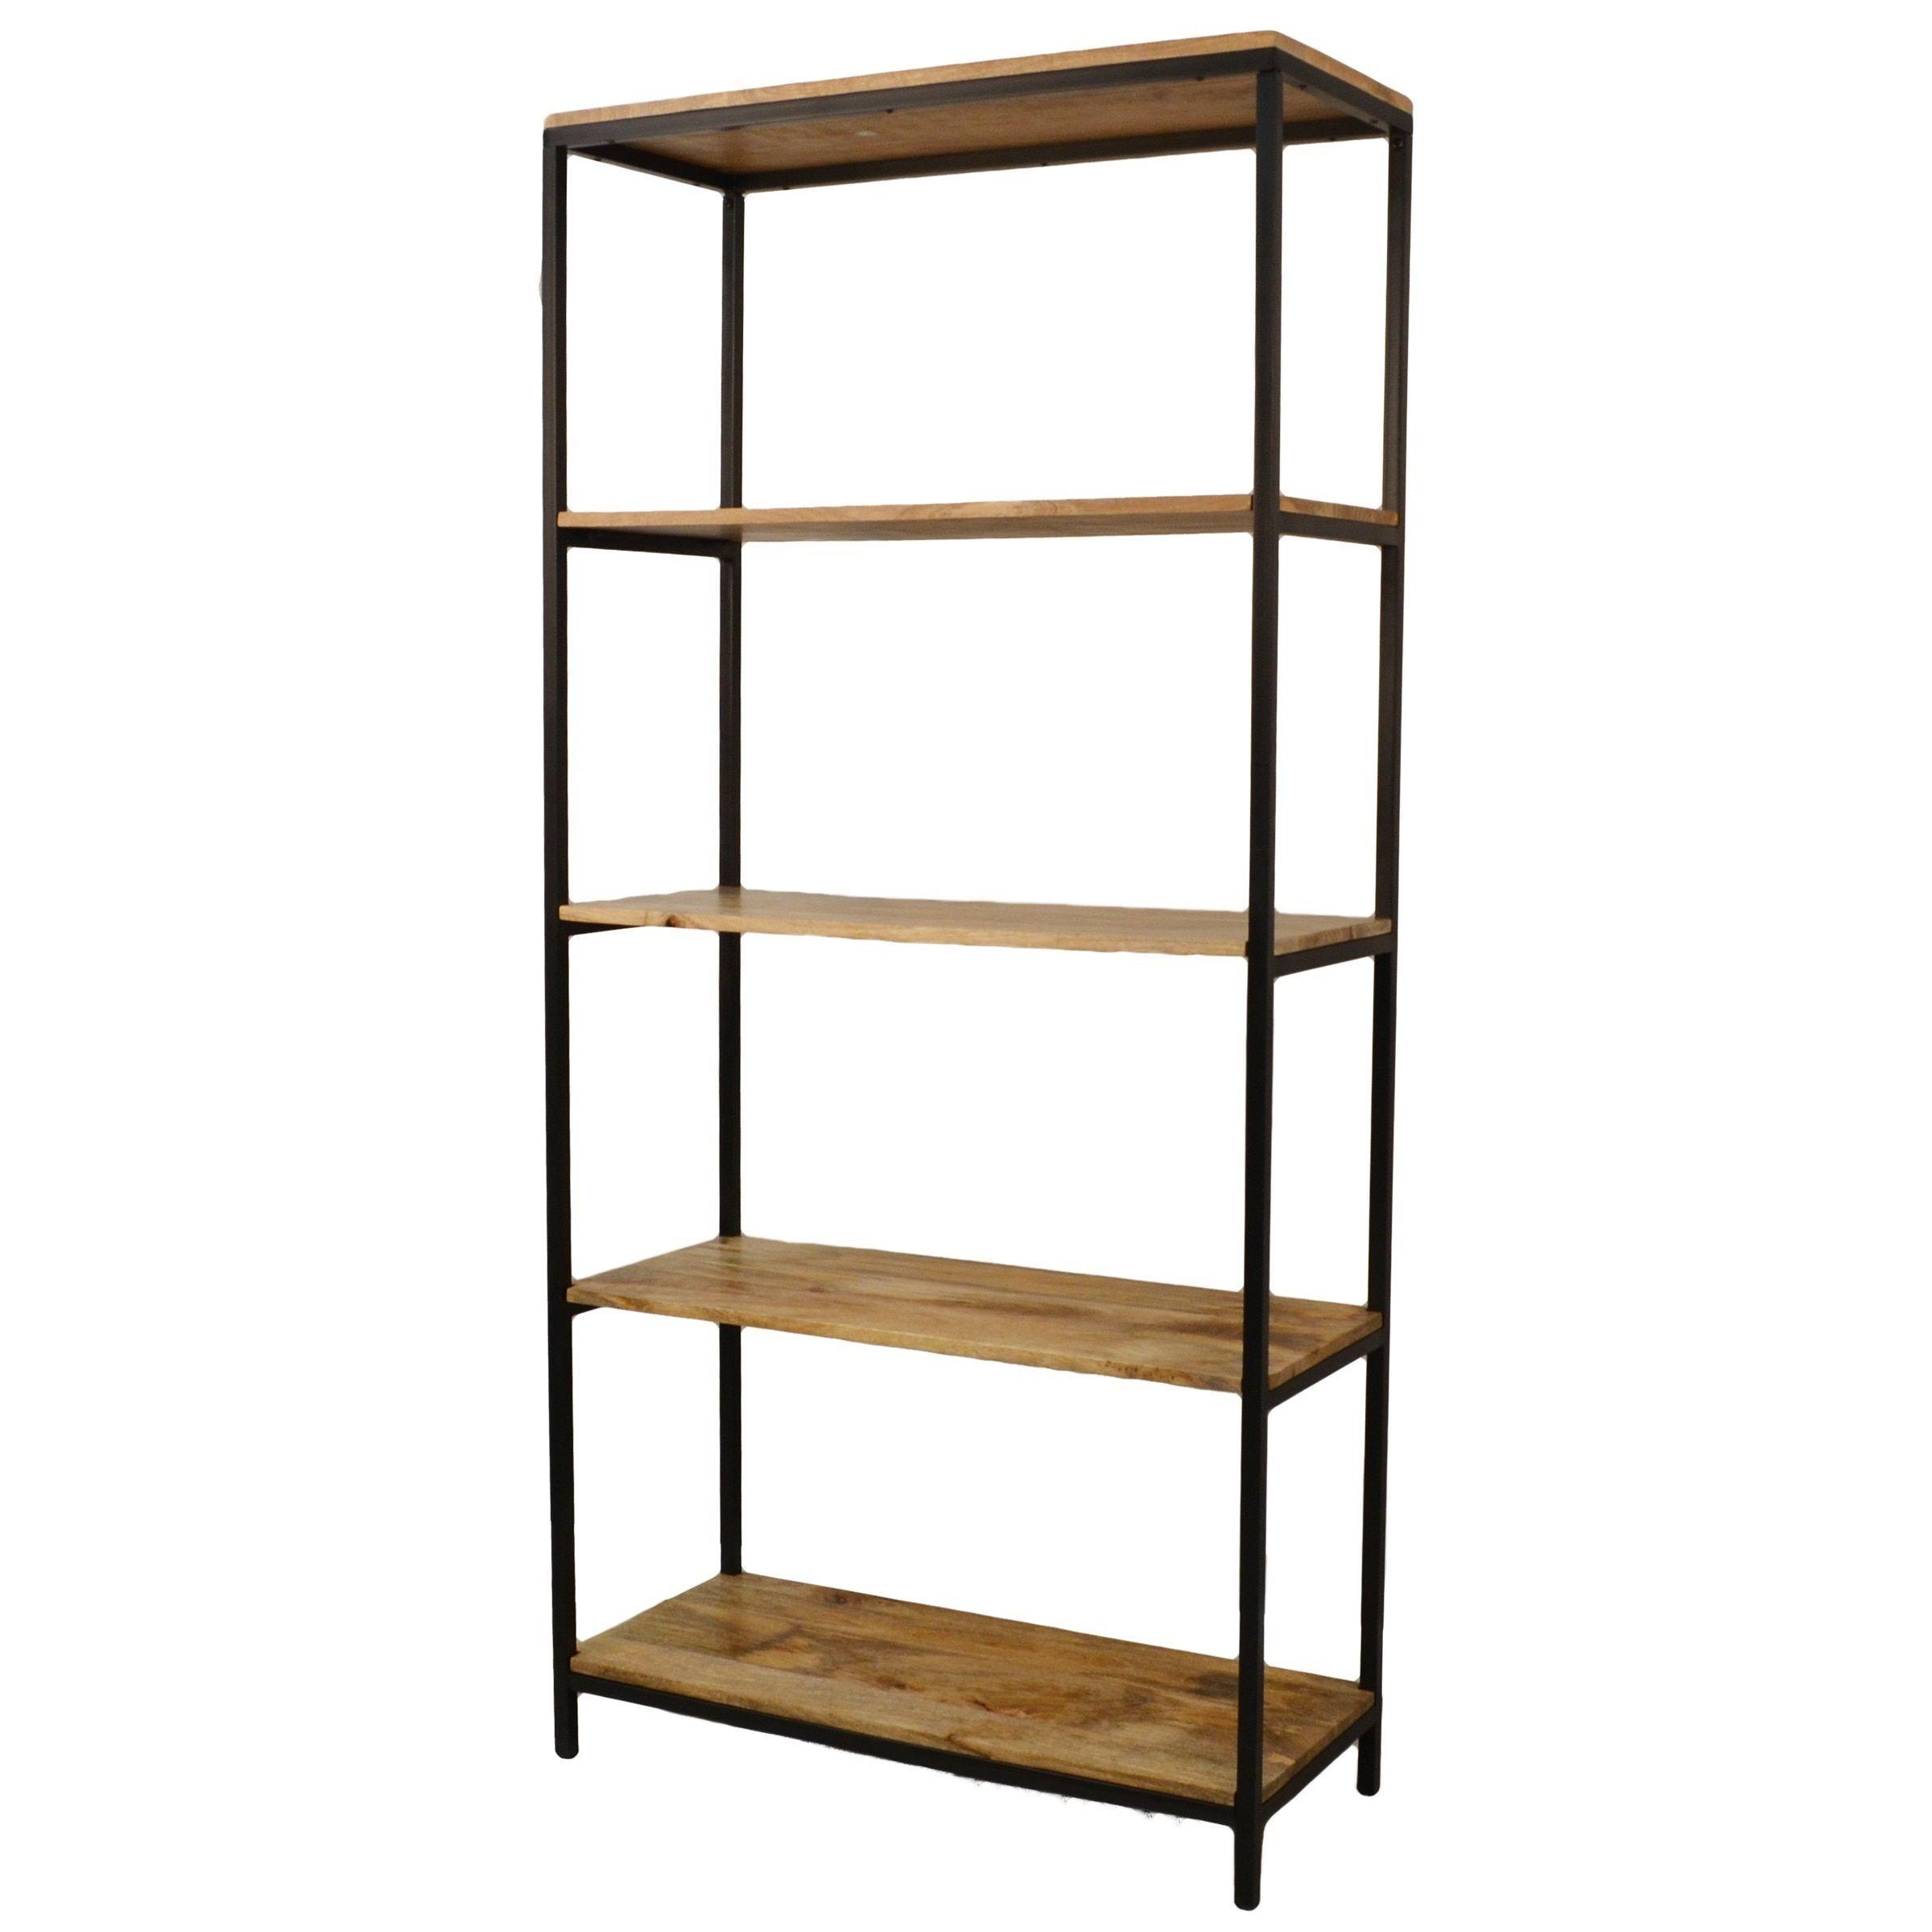 Carolina finn tall bookcase chestnut brown products